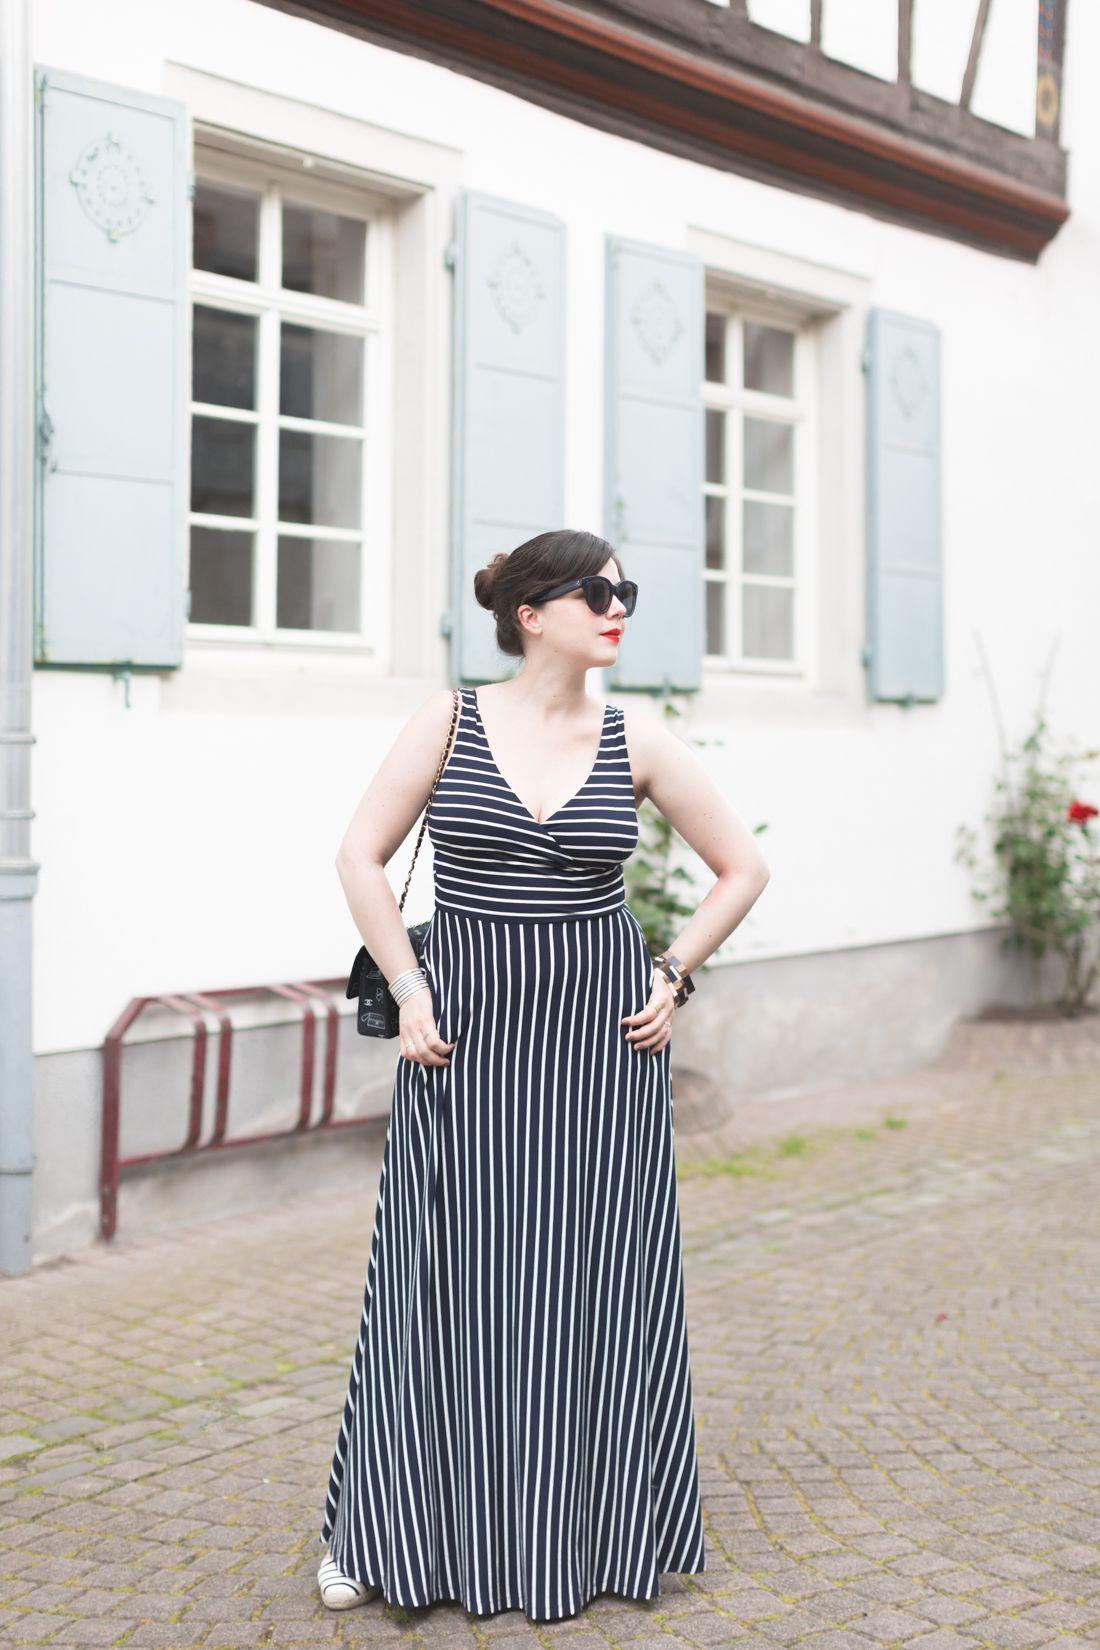 0858c2d088e12 French blogger Pauline in the full skirt maxi dress. This black and white  stripe dress